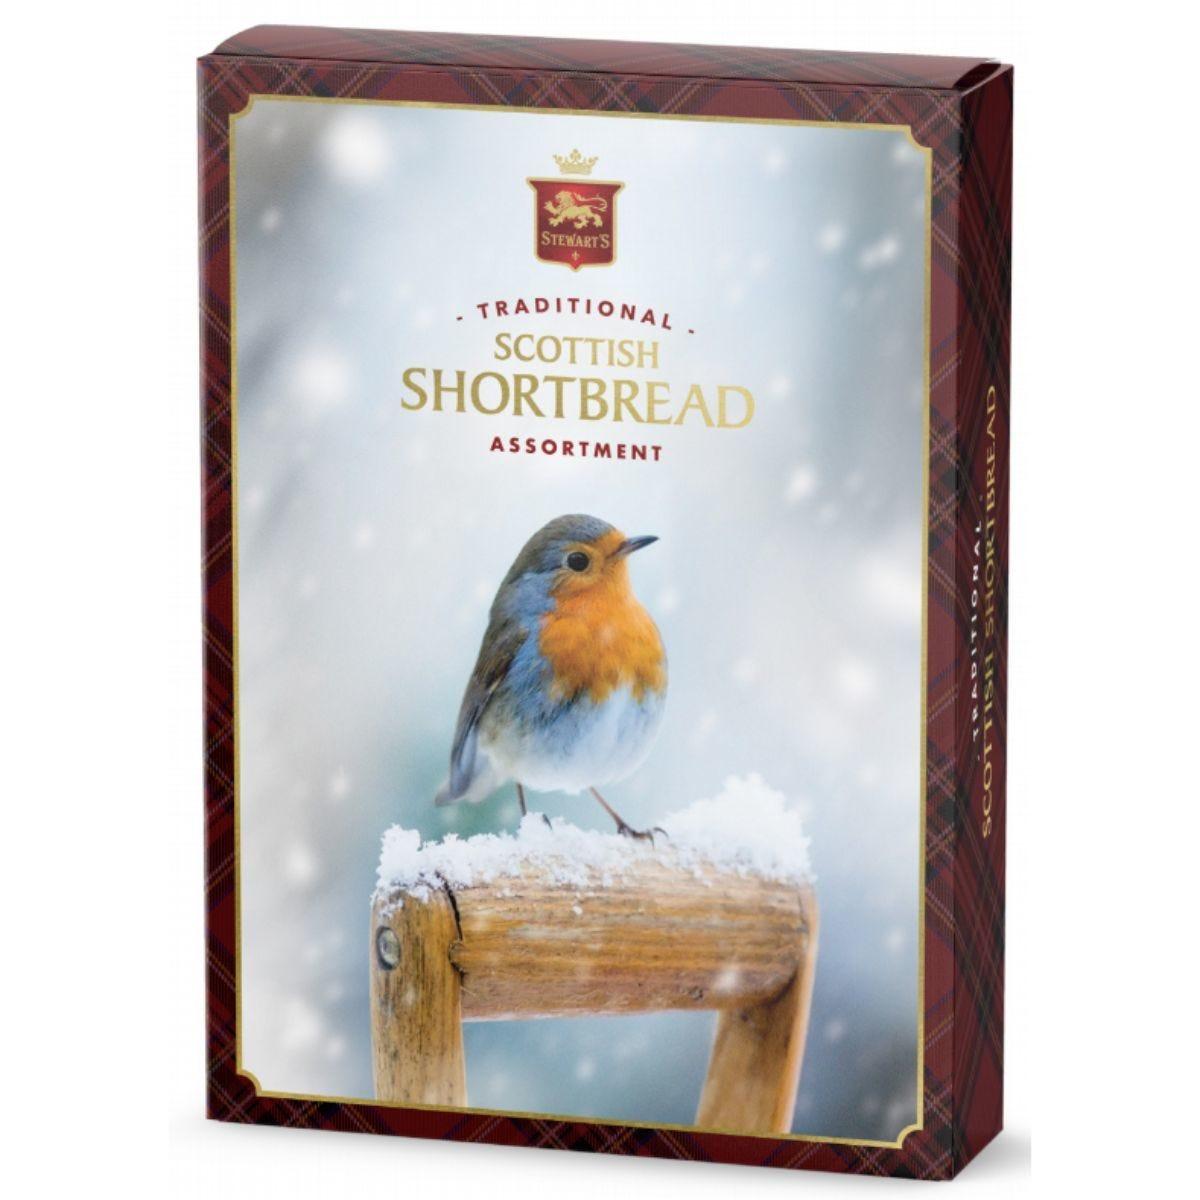 Stewarts Robin Traditional Scottish Shortbread Assortment - 400g